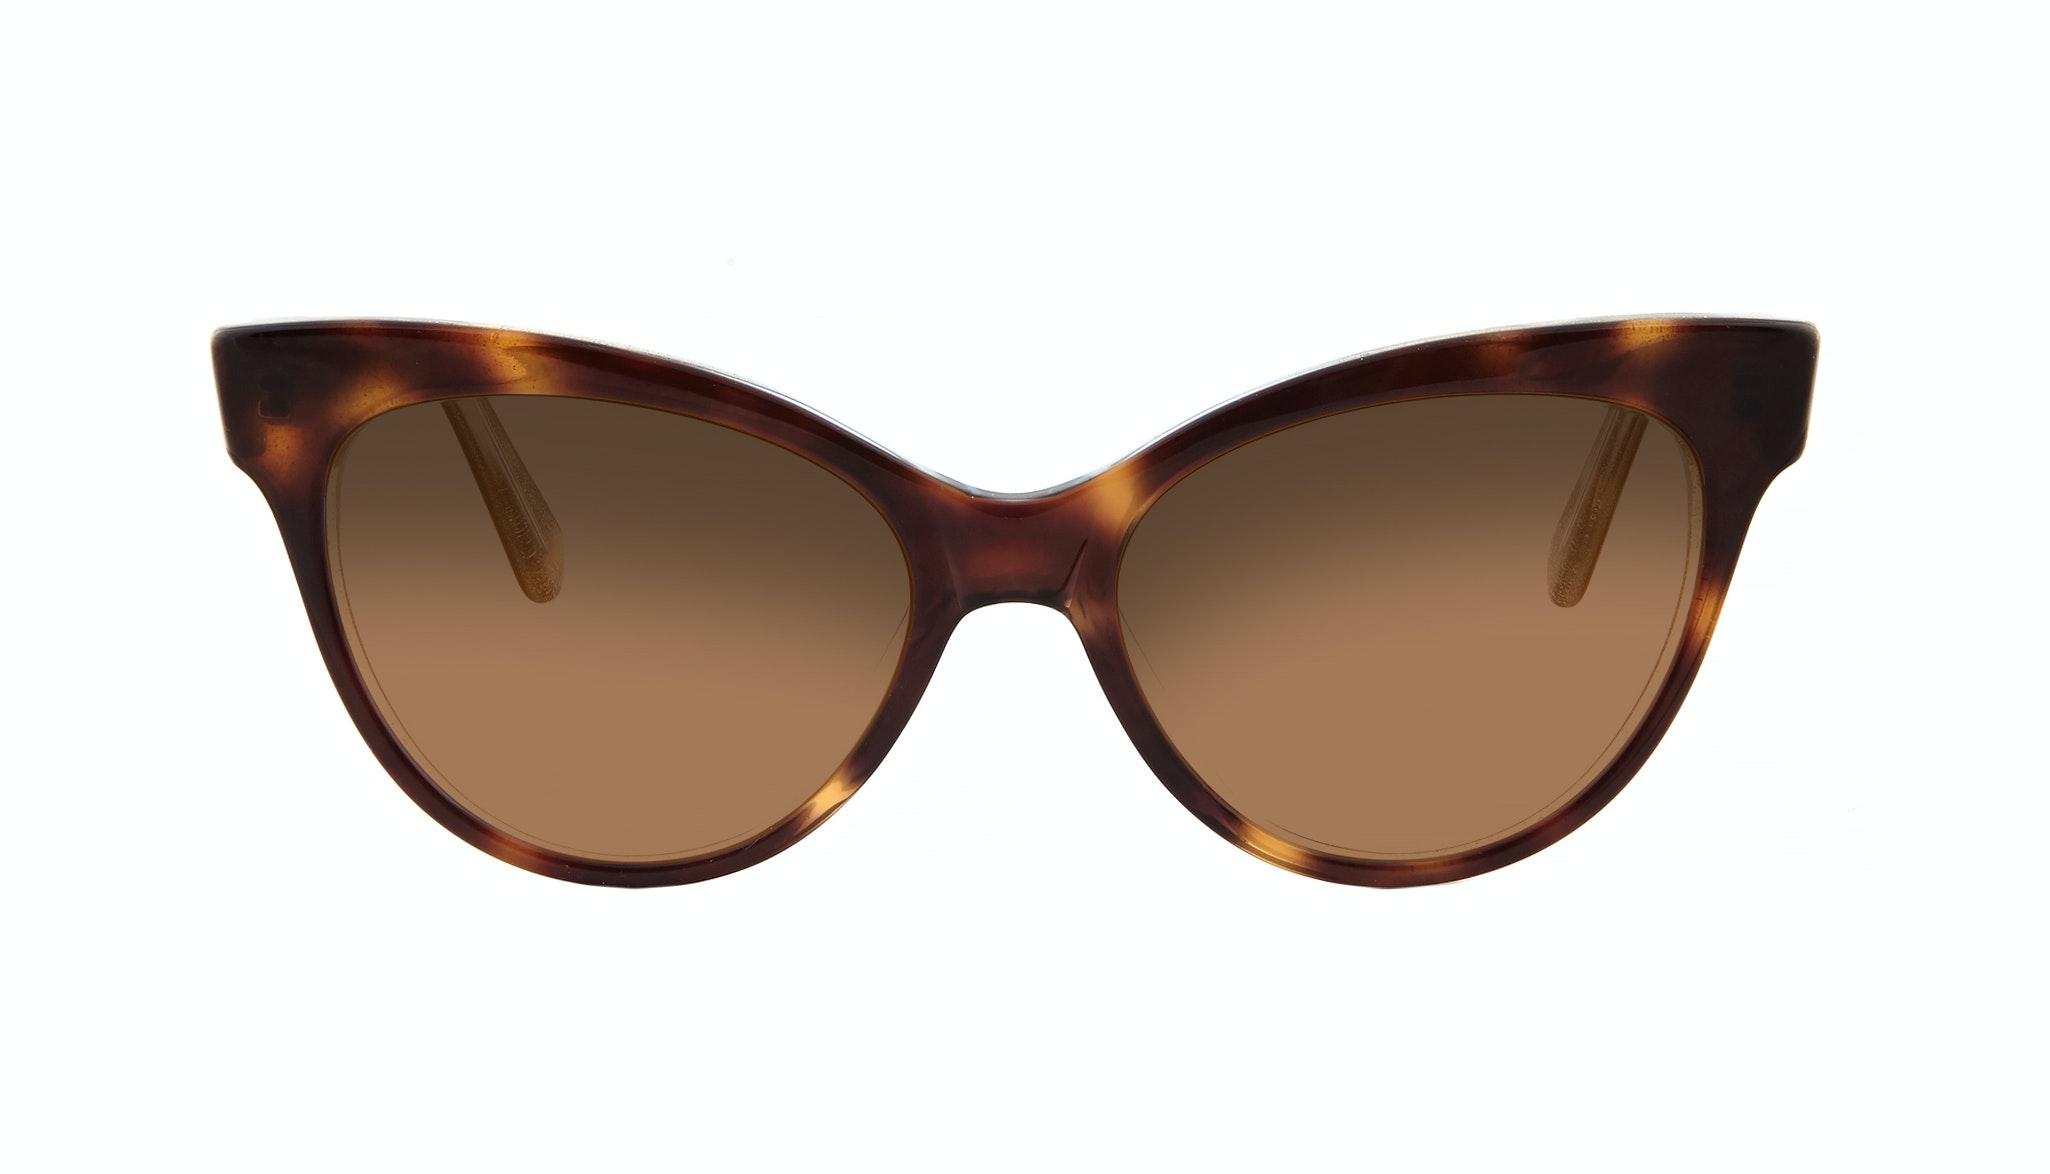 Affordable Fashion Glasses Cat Eye Daring Cateye Sunglasses Women SkunkBoy Twinkle Tort